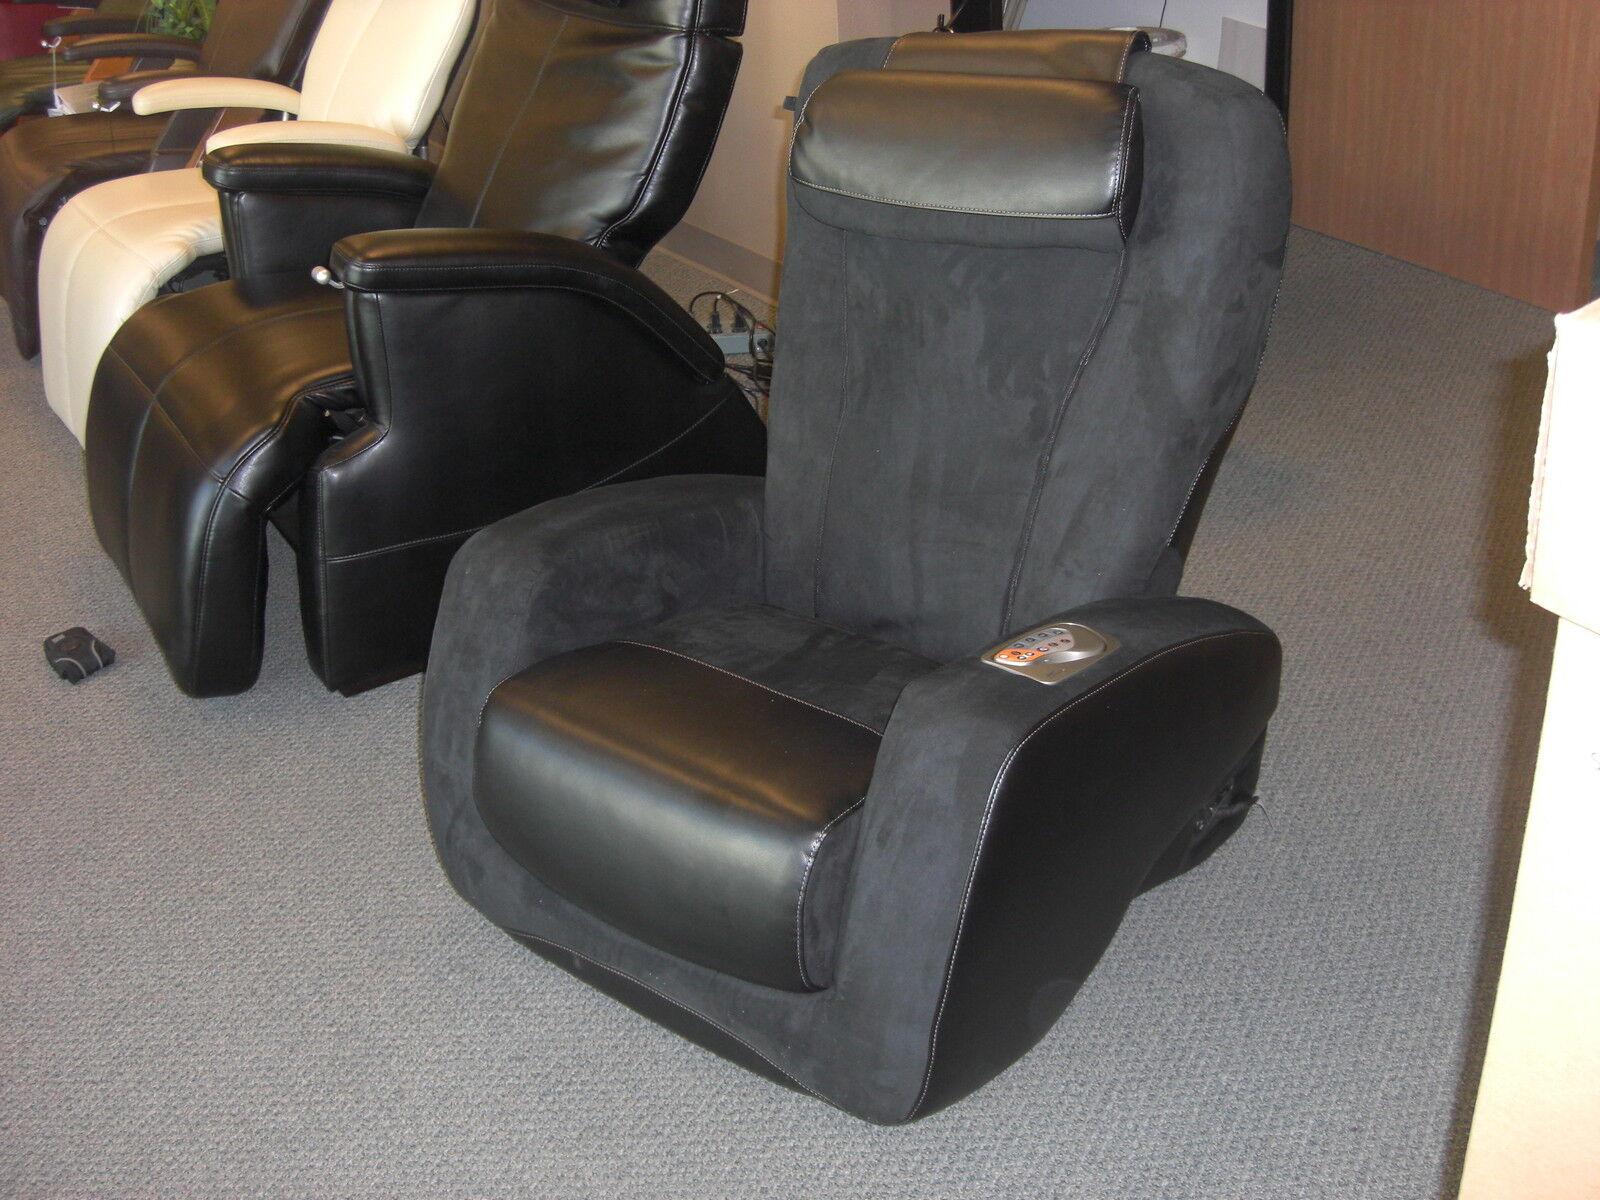 Human Touch IJOY 2400 Robotic Massage Chair Ergonomic Recline